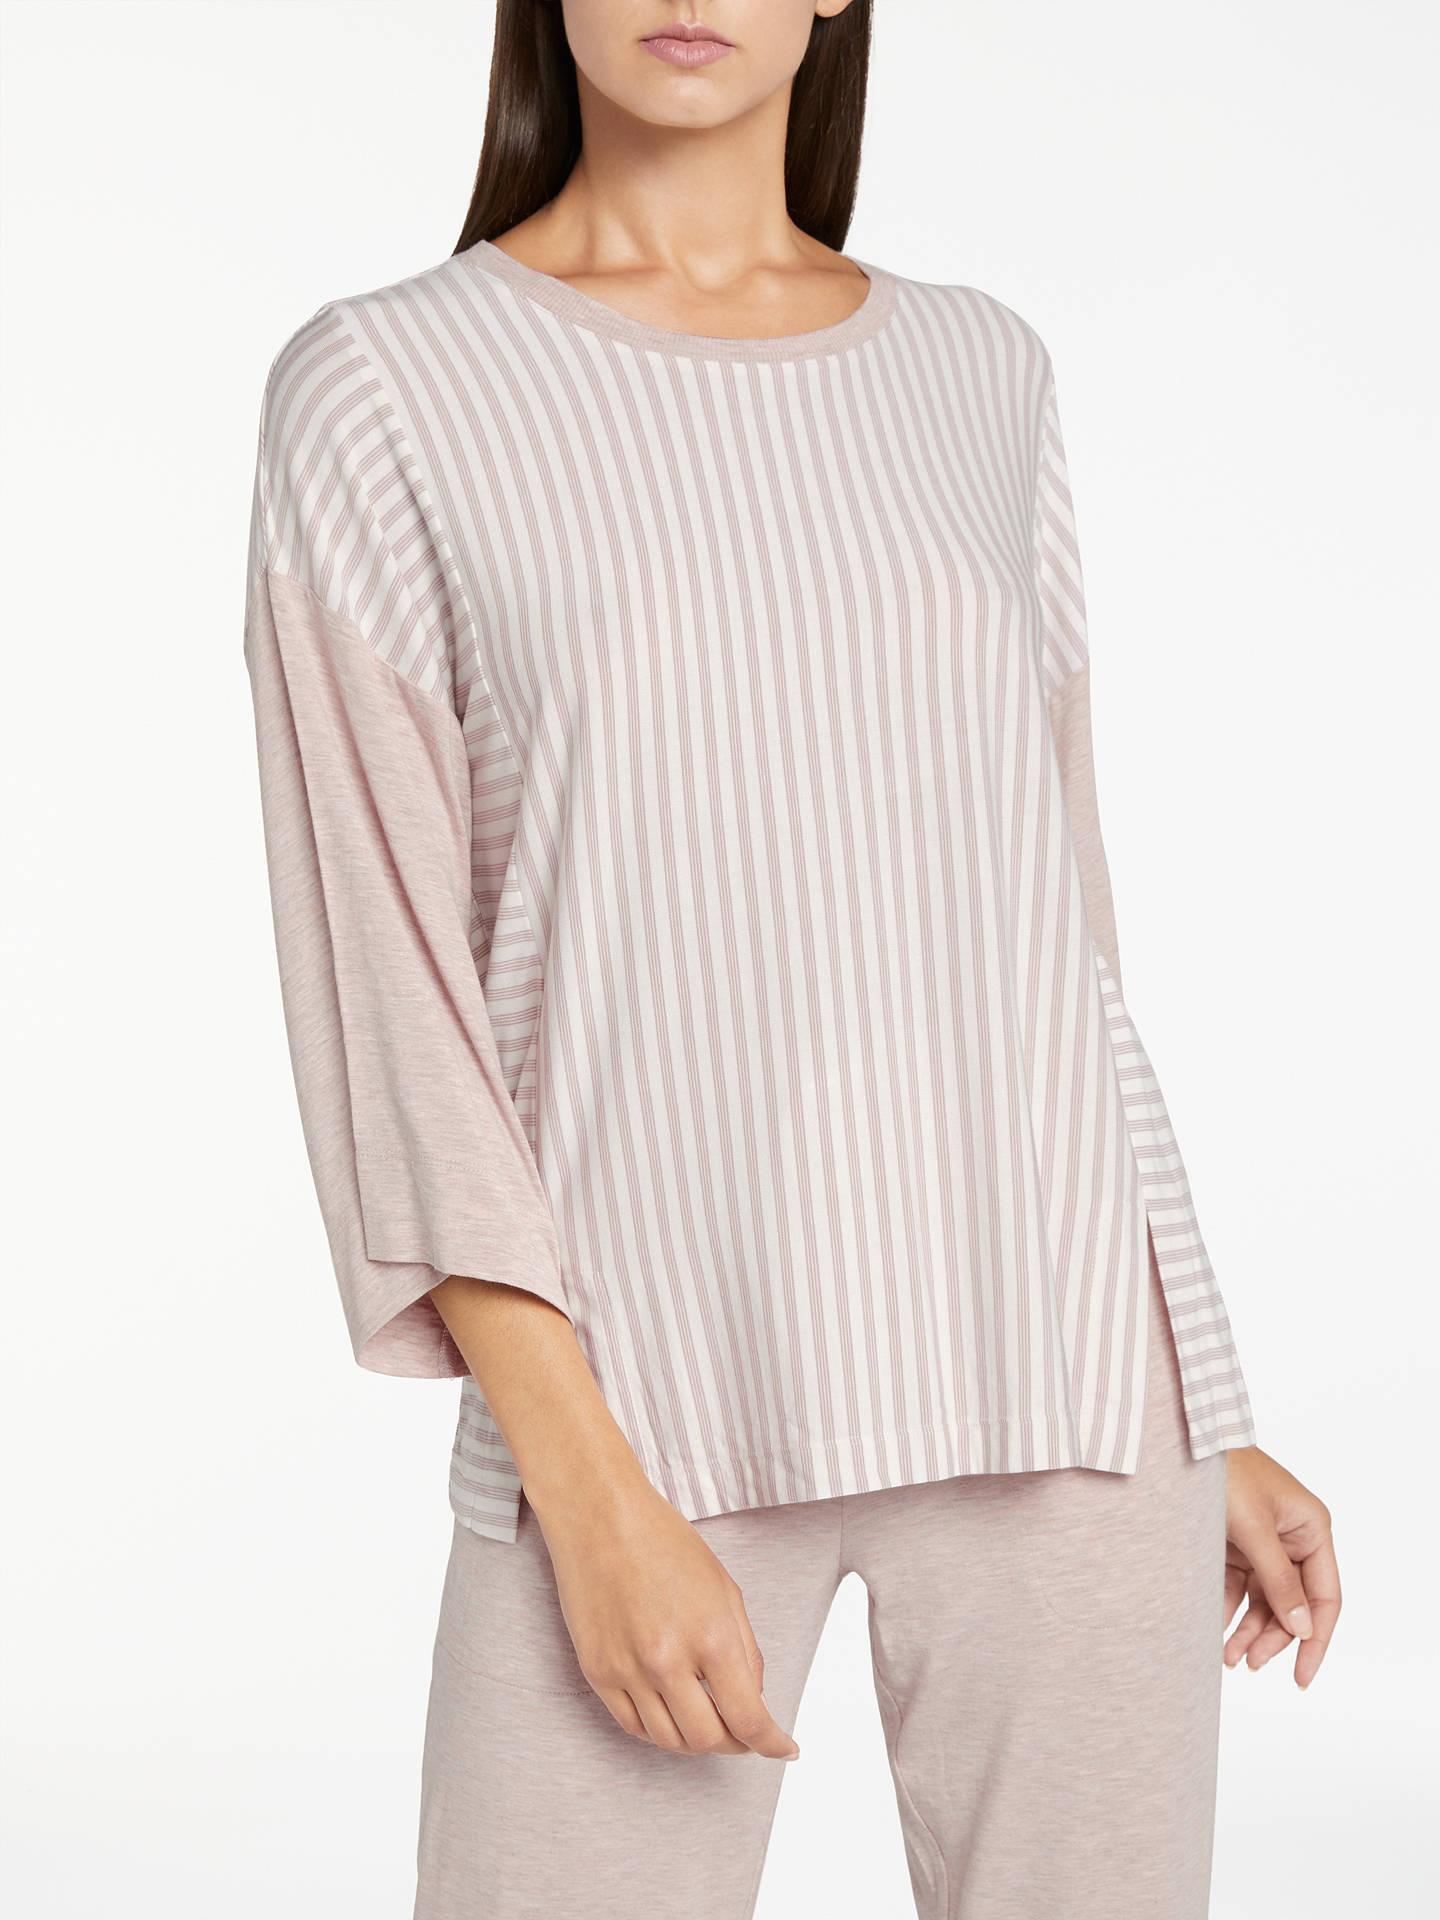 BuyDKNY City Stripes 3 4 Sleeve Pyjama Top e97499361